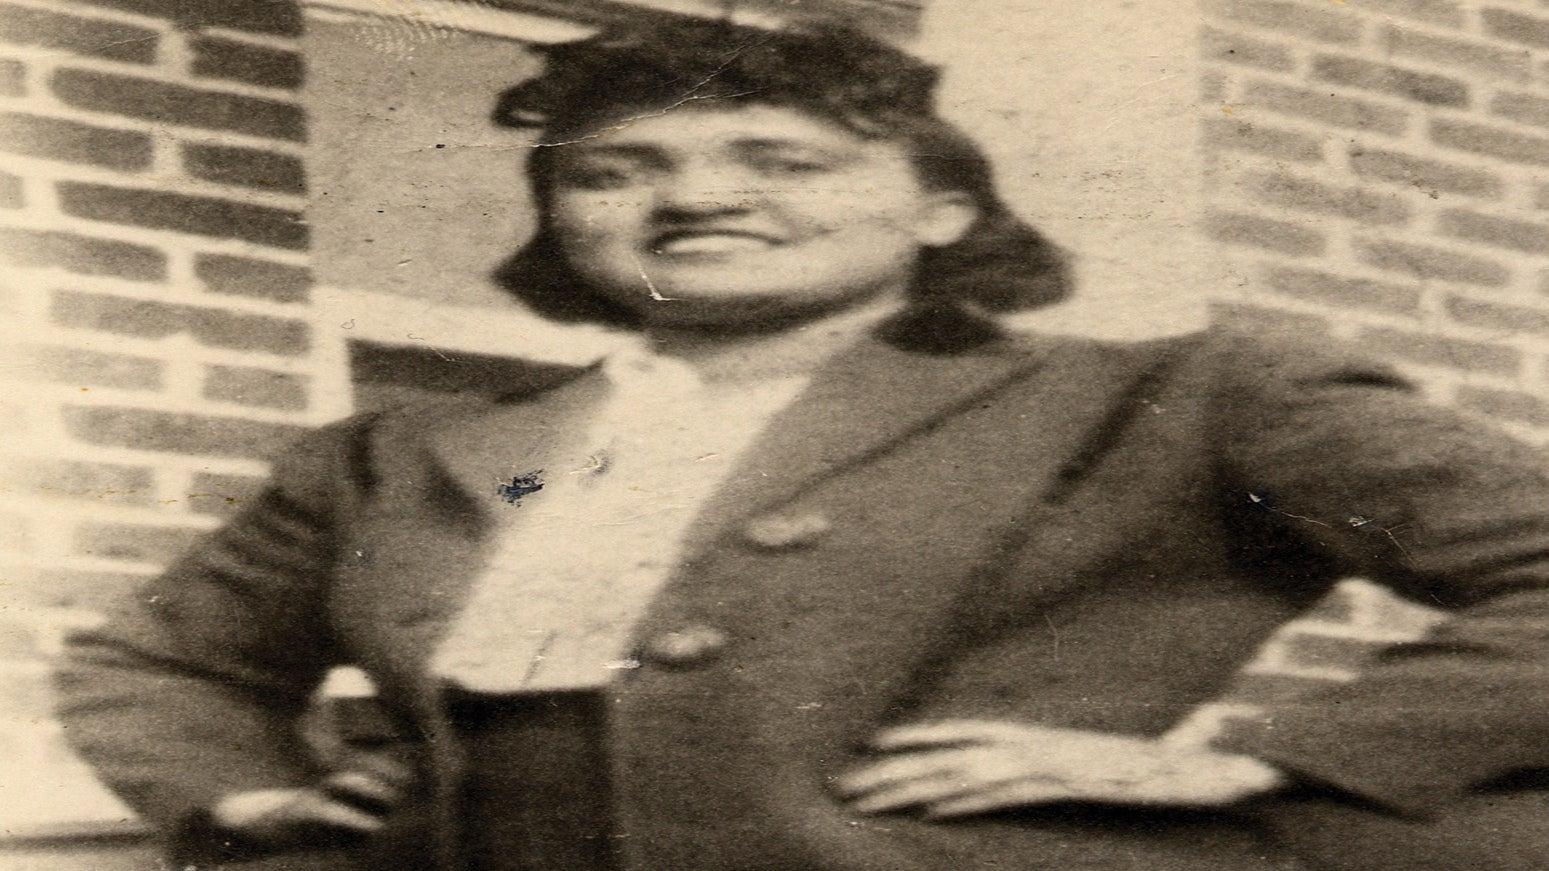 Johns Hopkins University To Finally Name Building After Henrietta Lacks